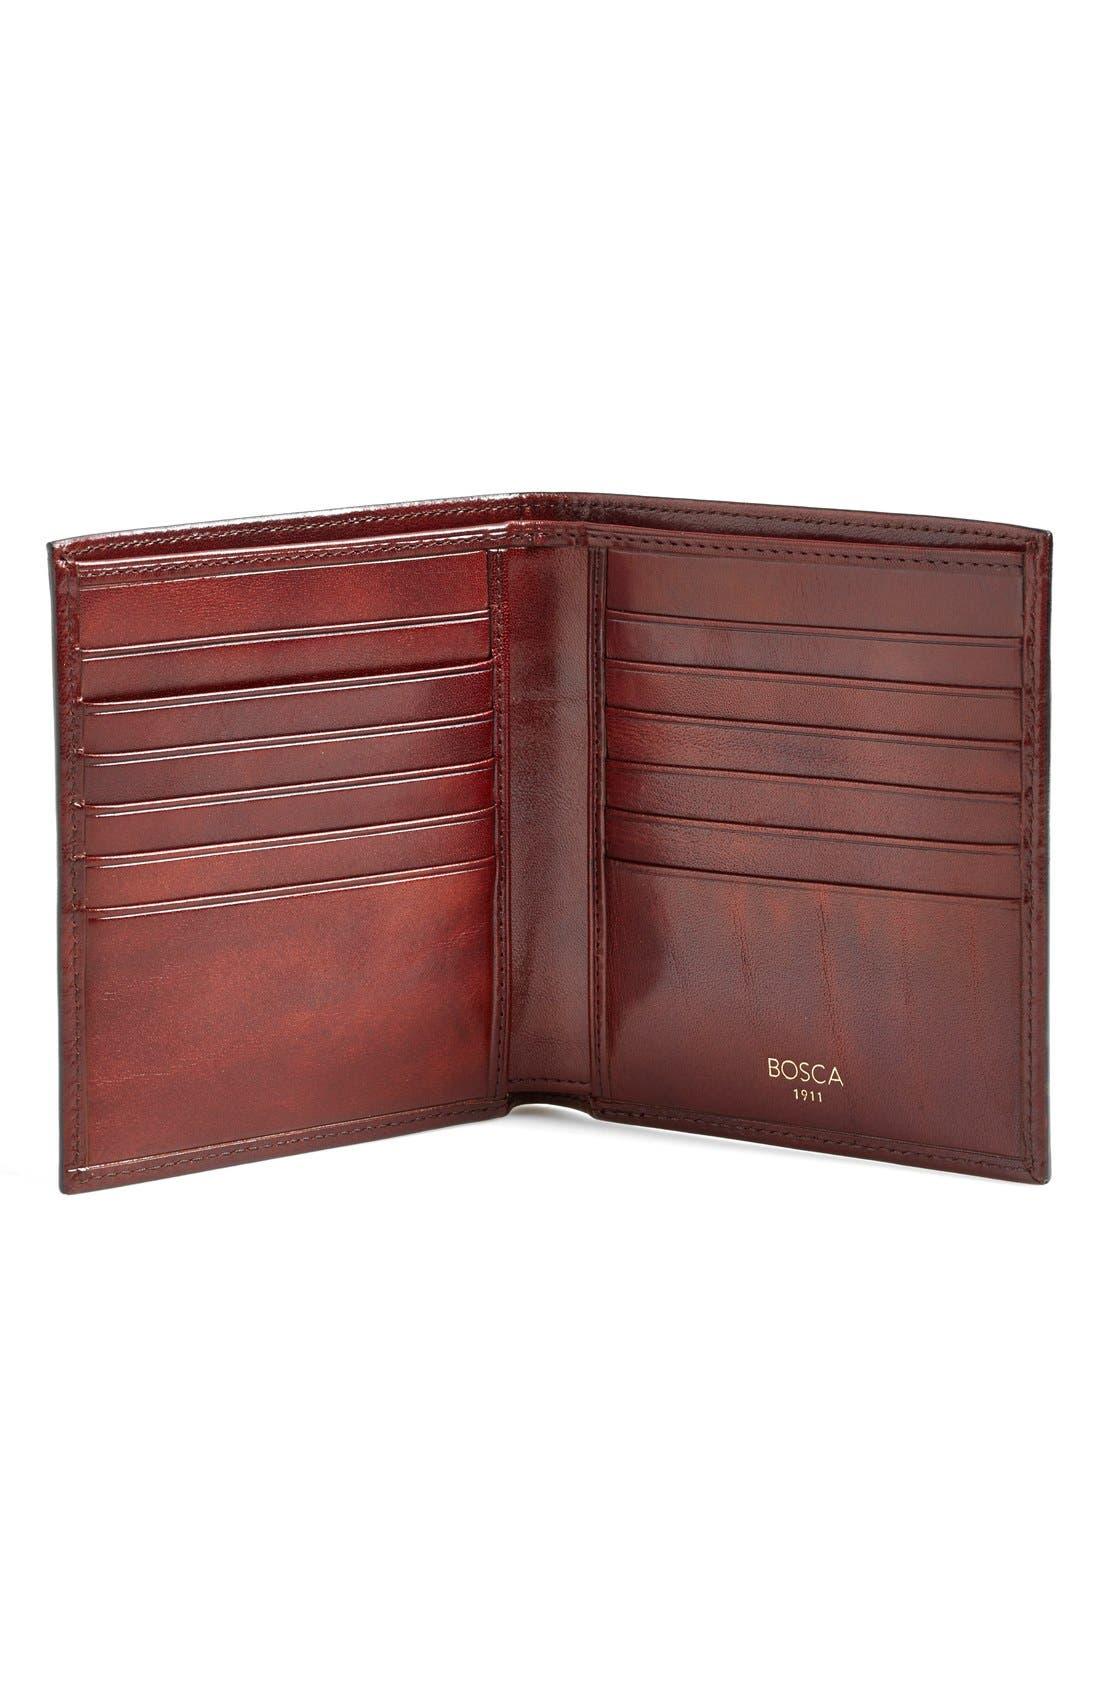 'Old Leather' Credit Wallet,                             Alternate thumbnail 3, color,                             DARK BROWN